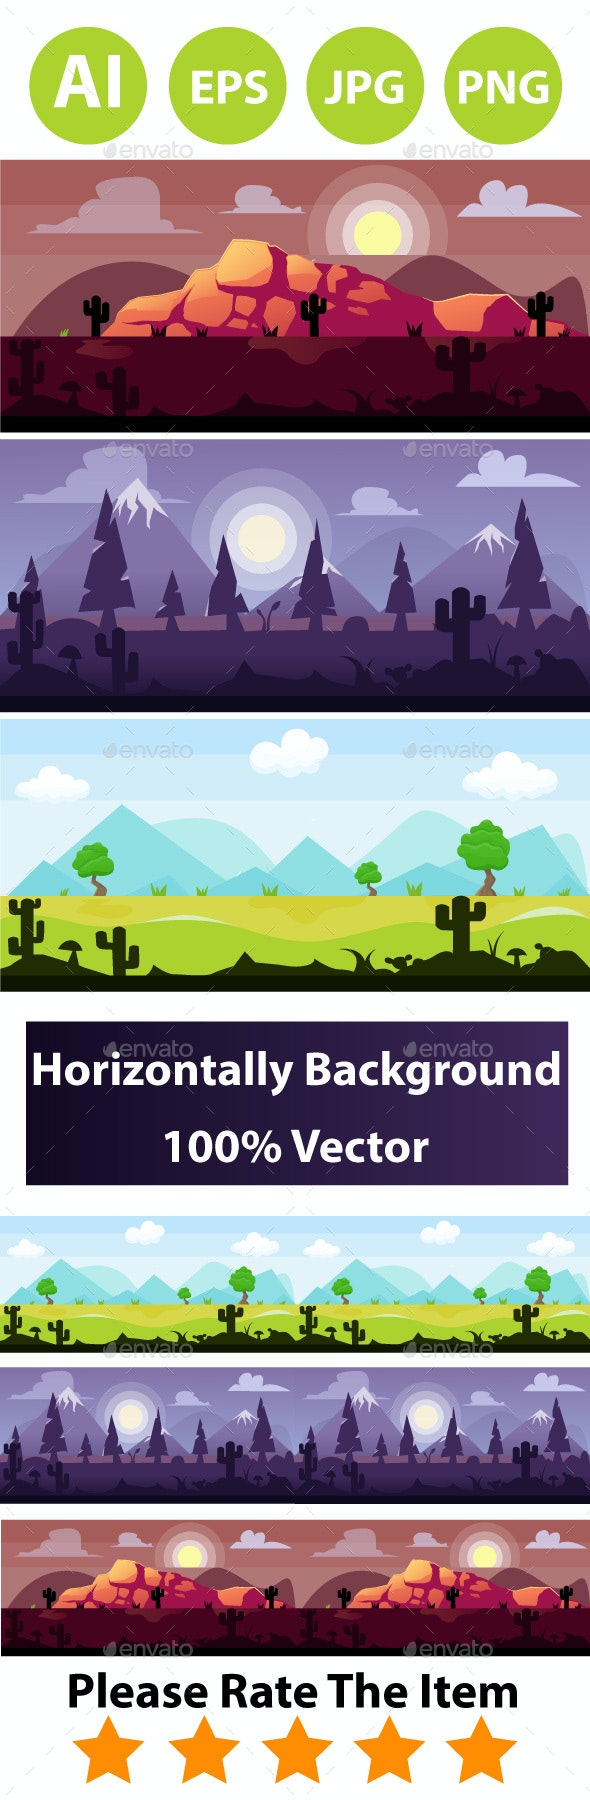 Game Background Set - Backgrounds Game Assets